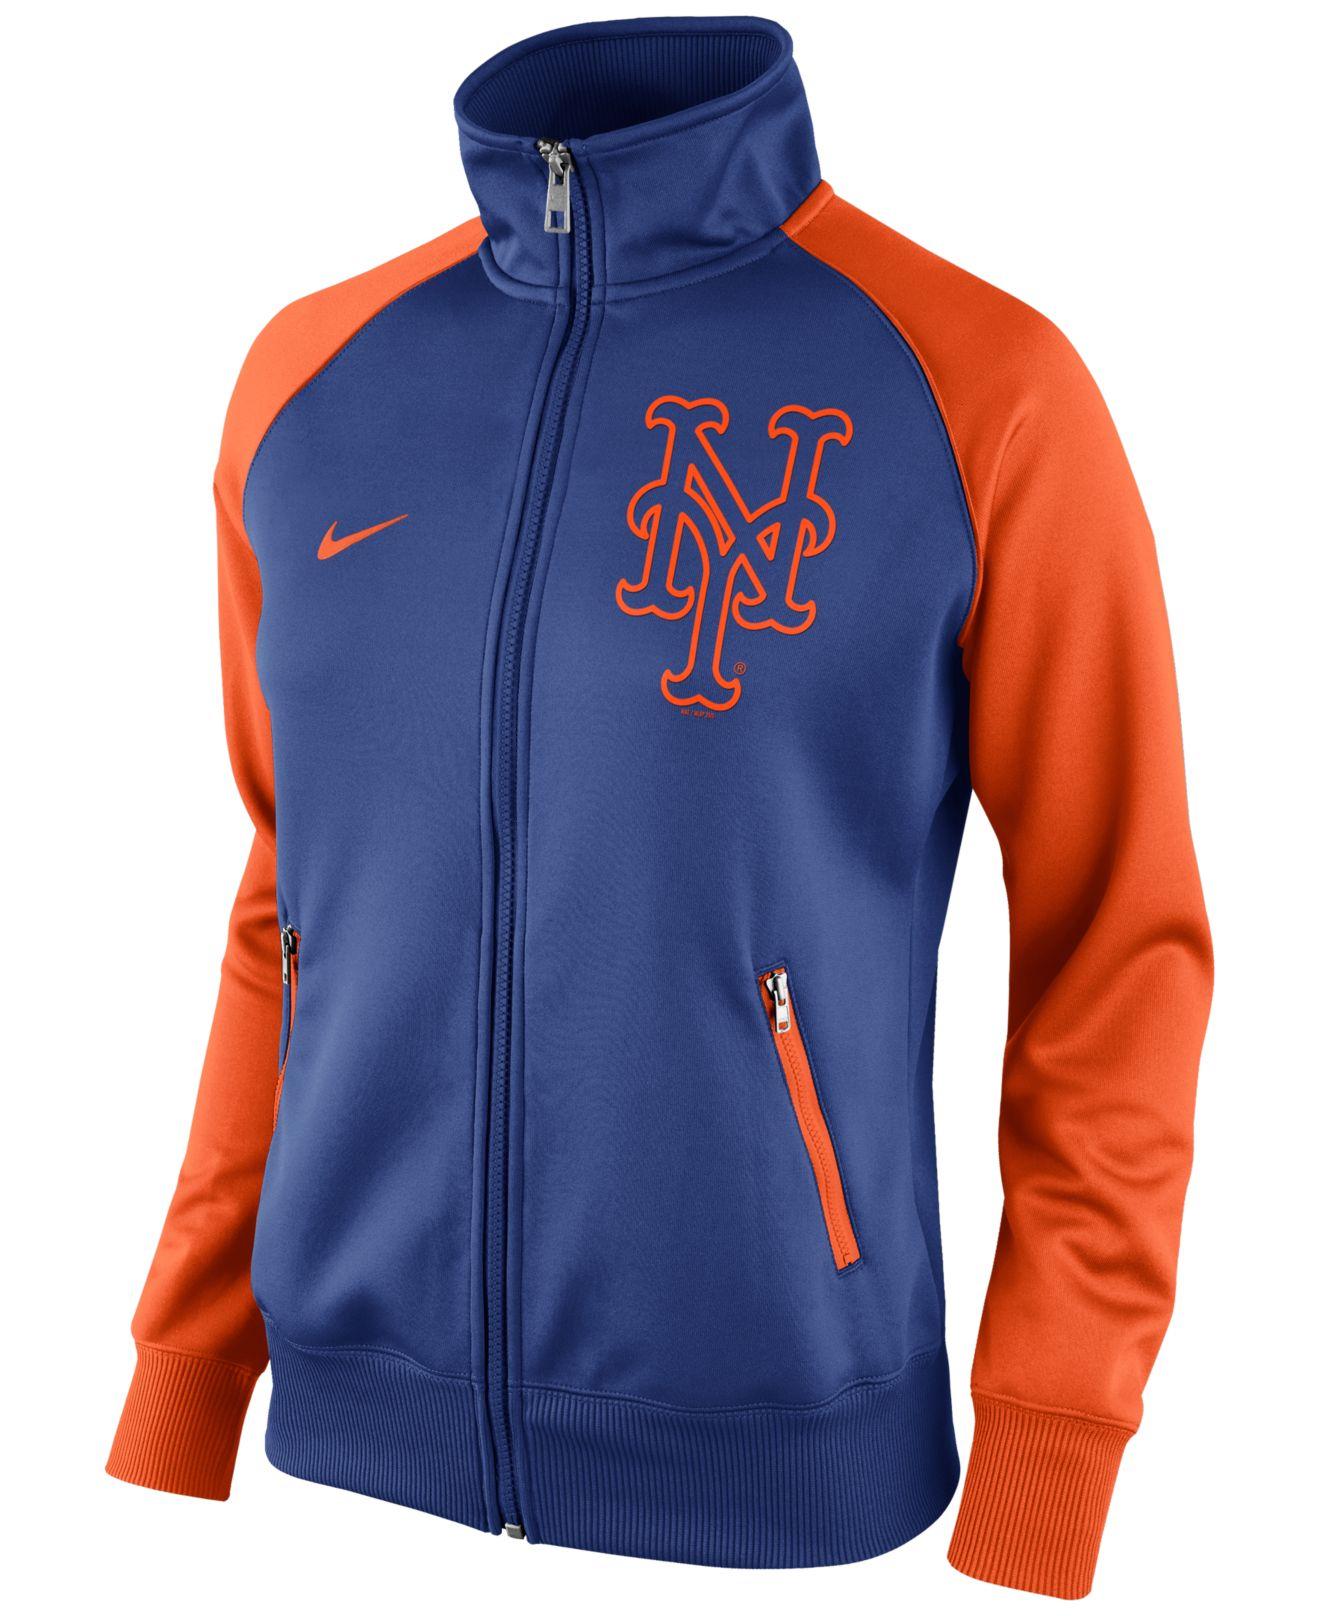 Nike jacket baseball - Gallery